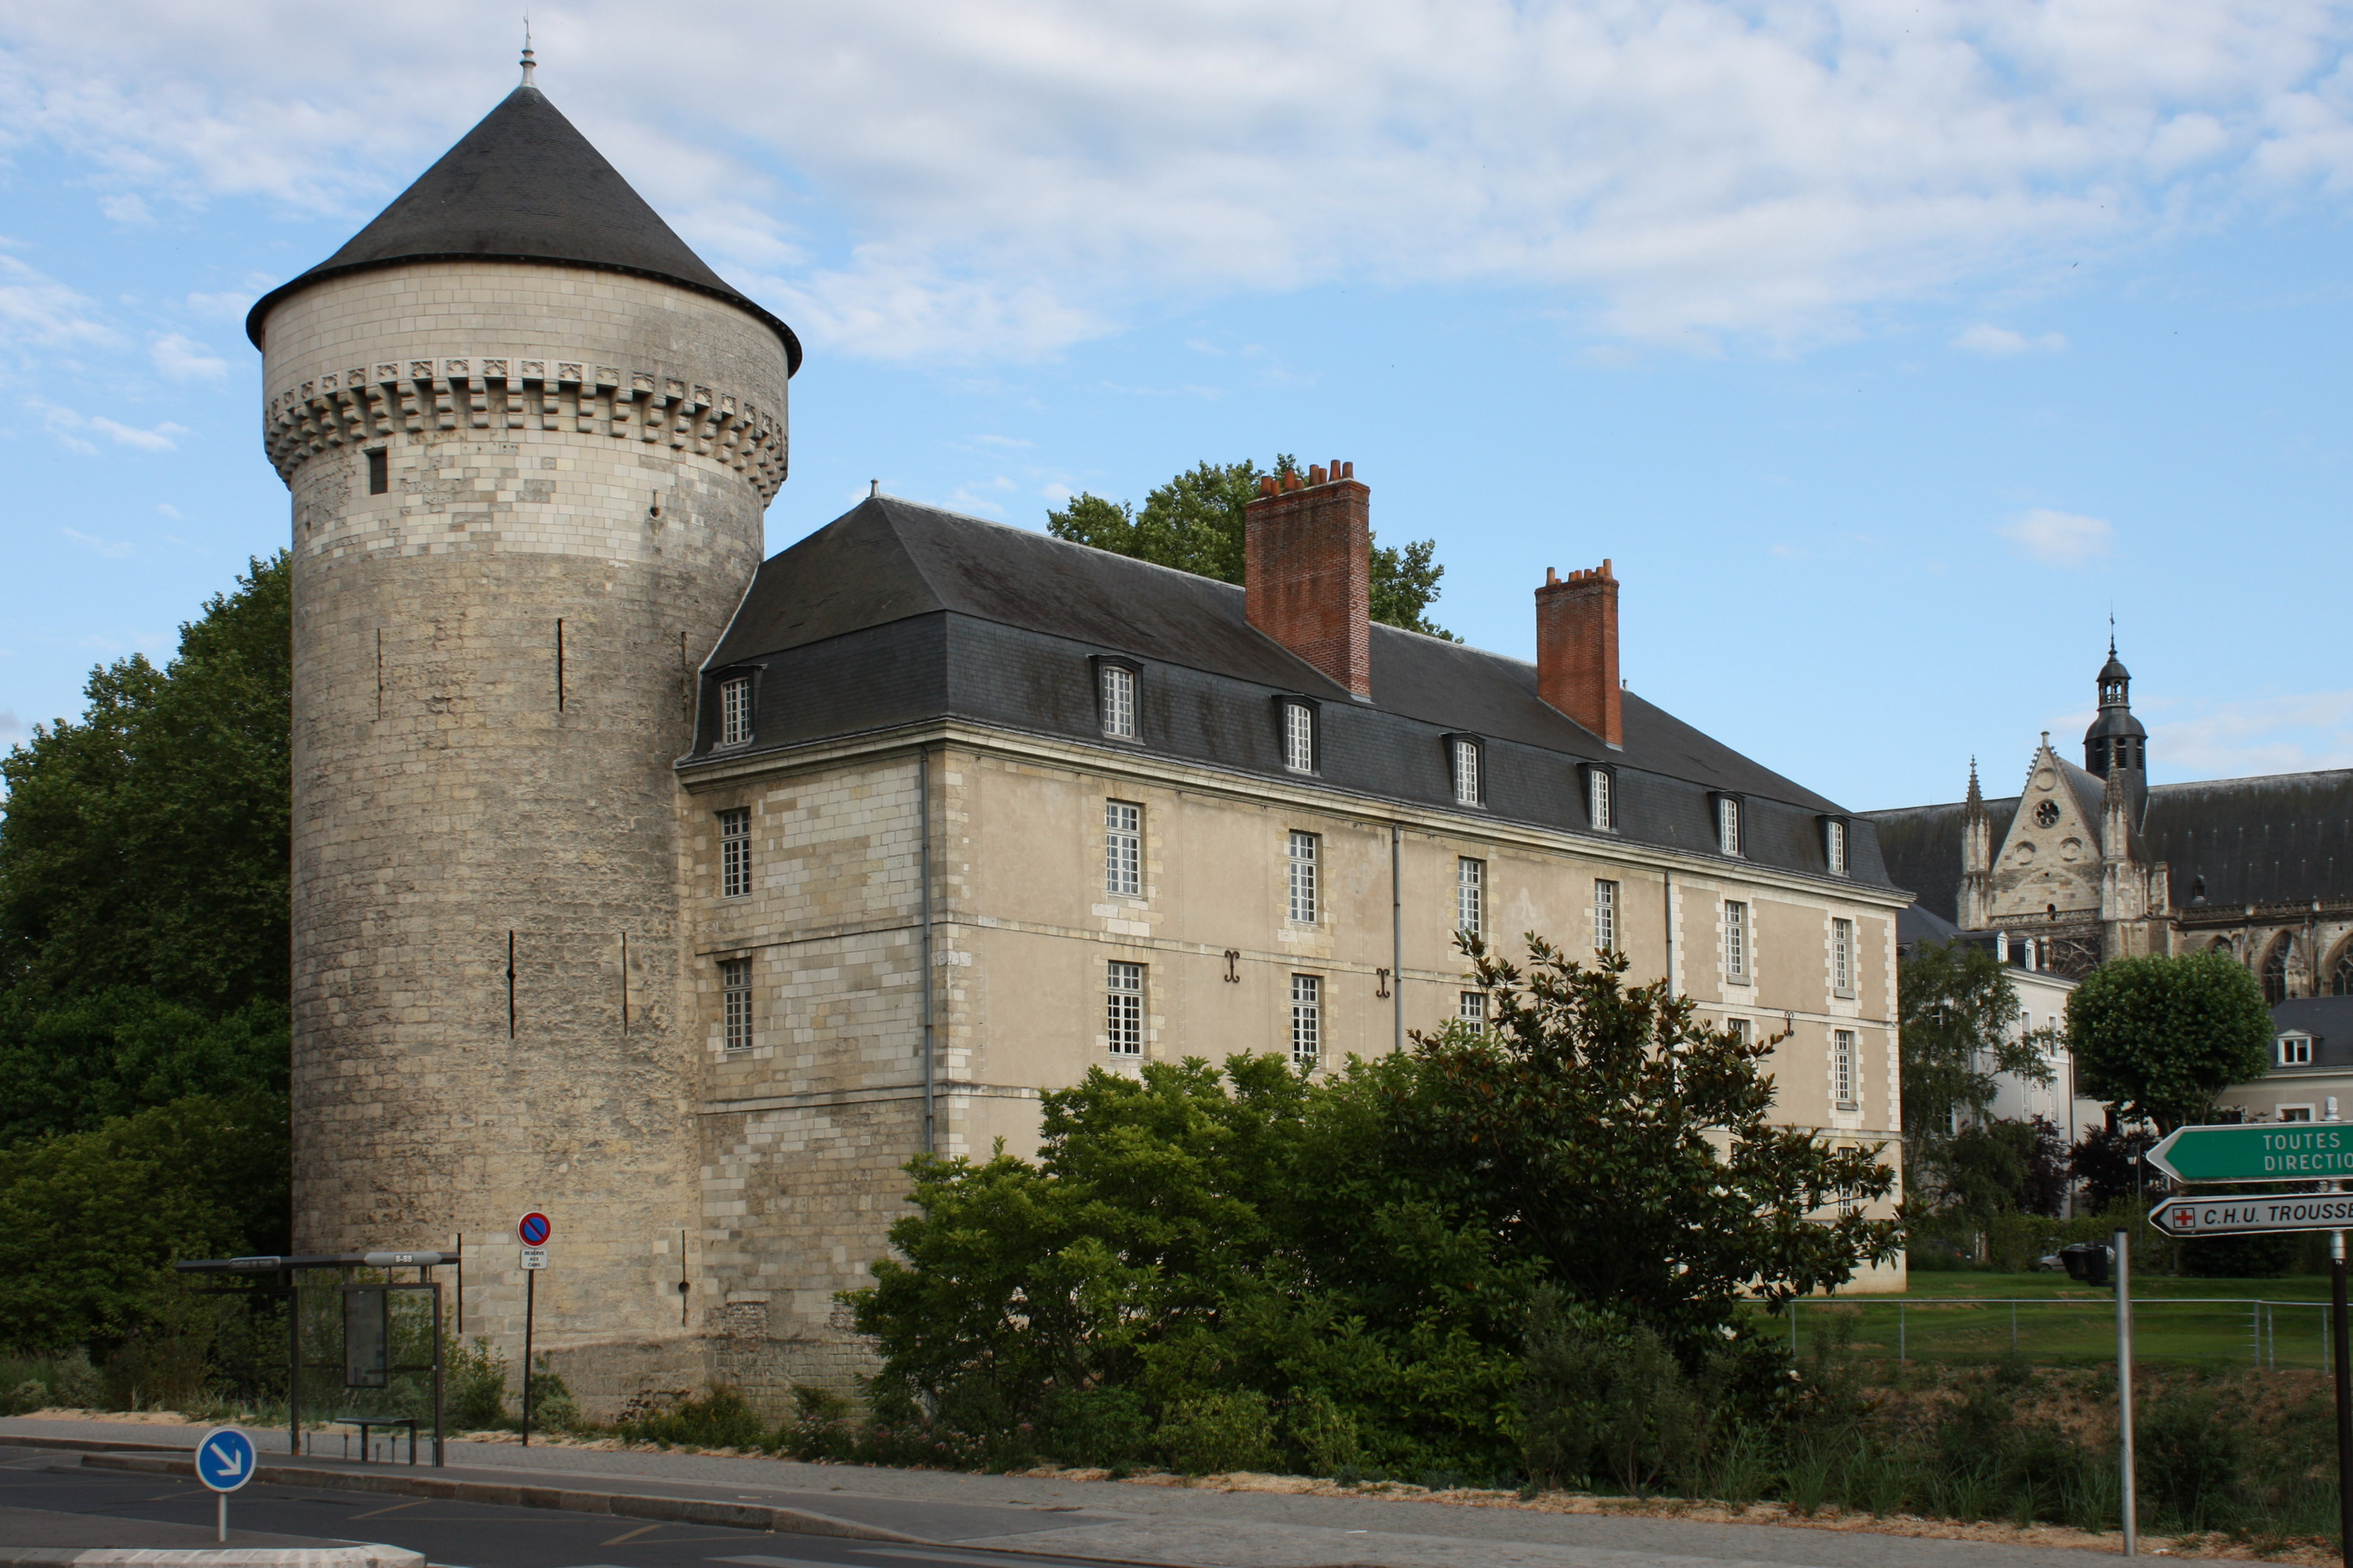 Château de Tours   Wikipedia